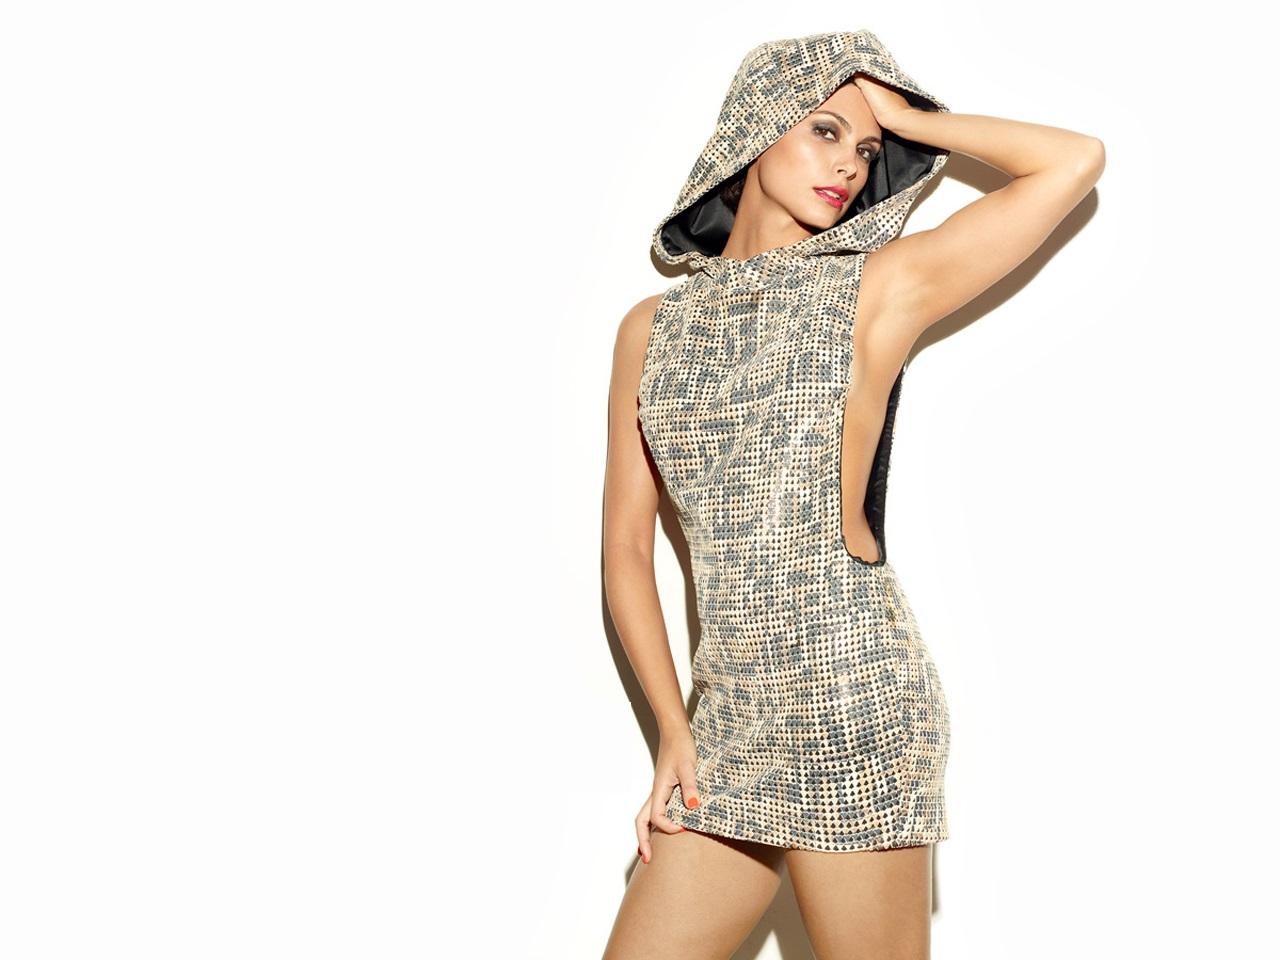 morena-baccarin-topless-pics